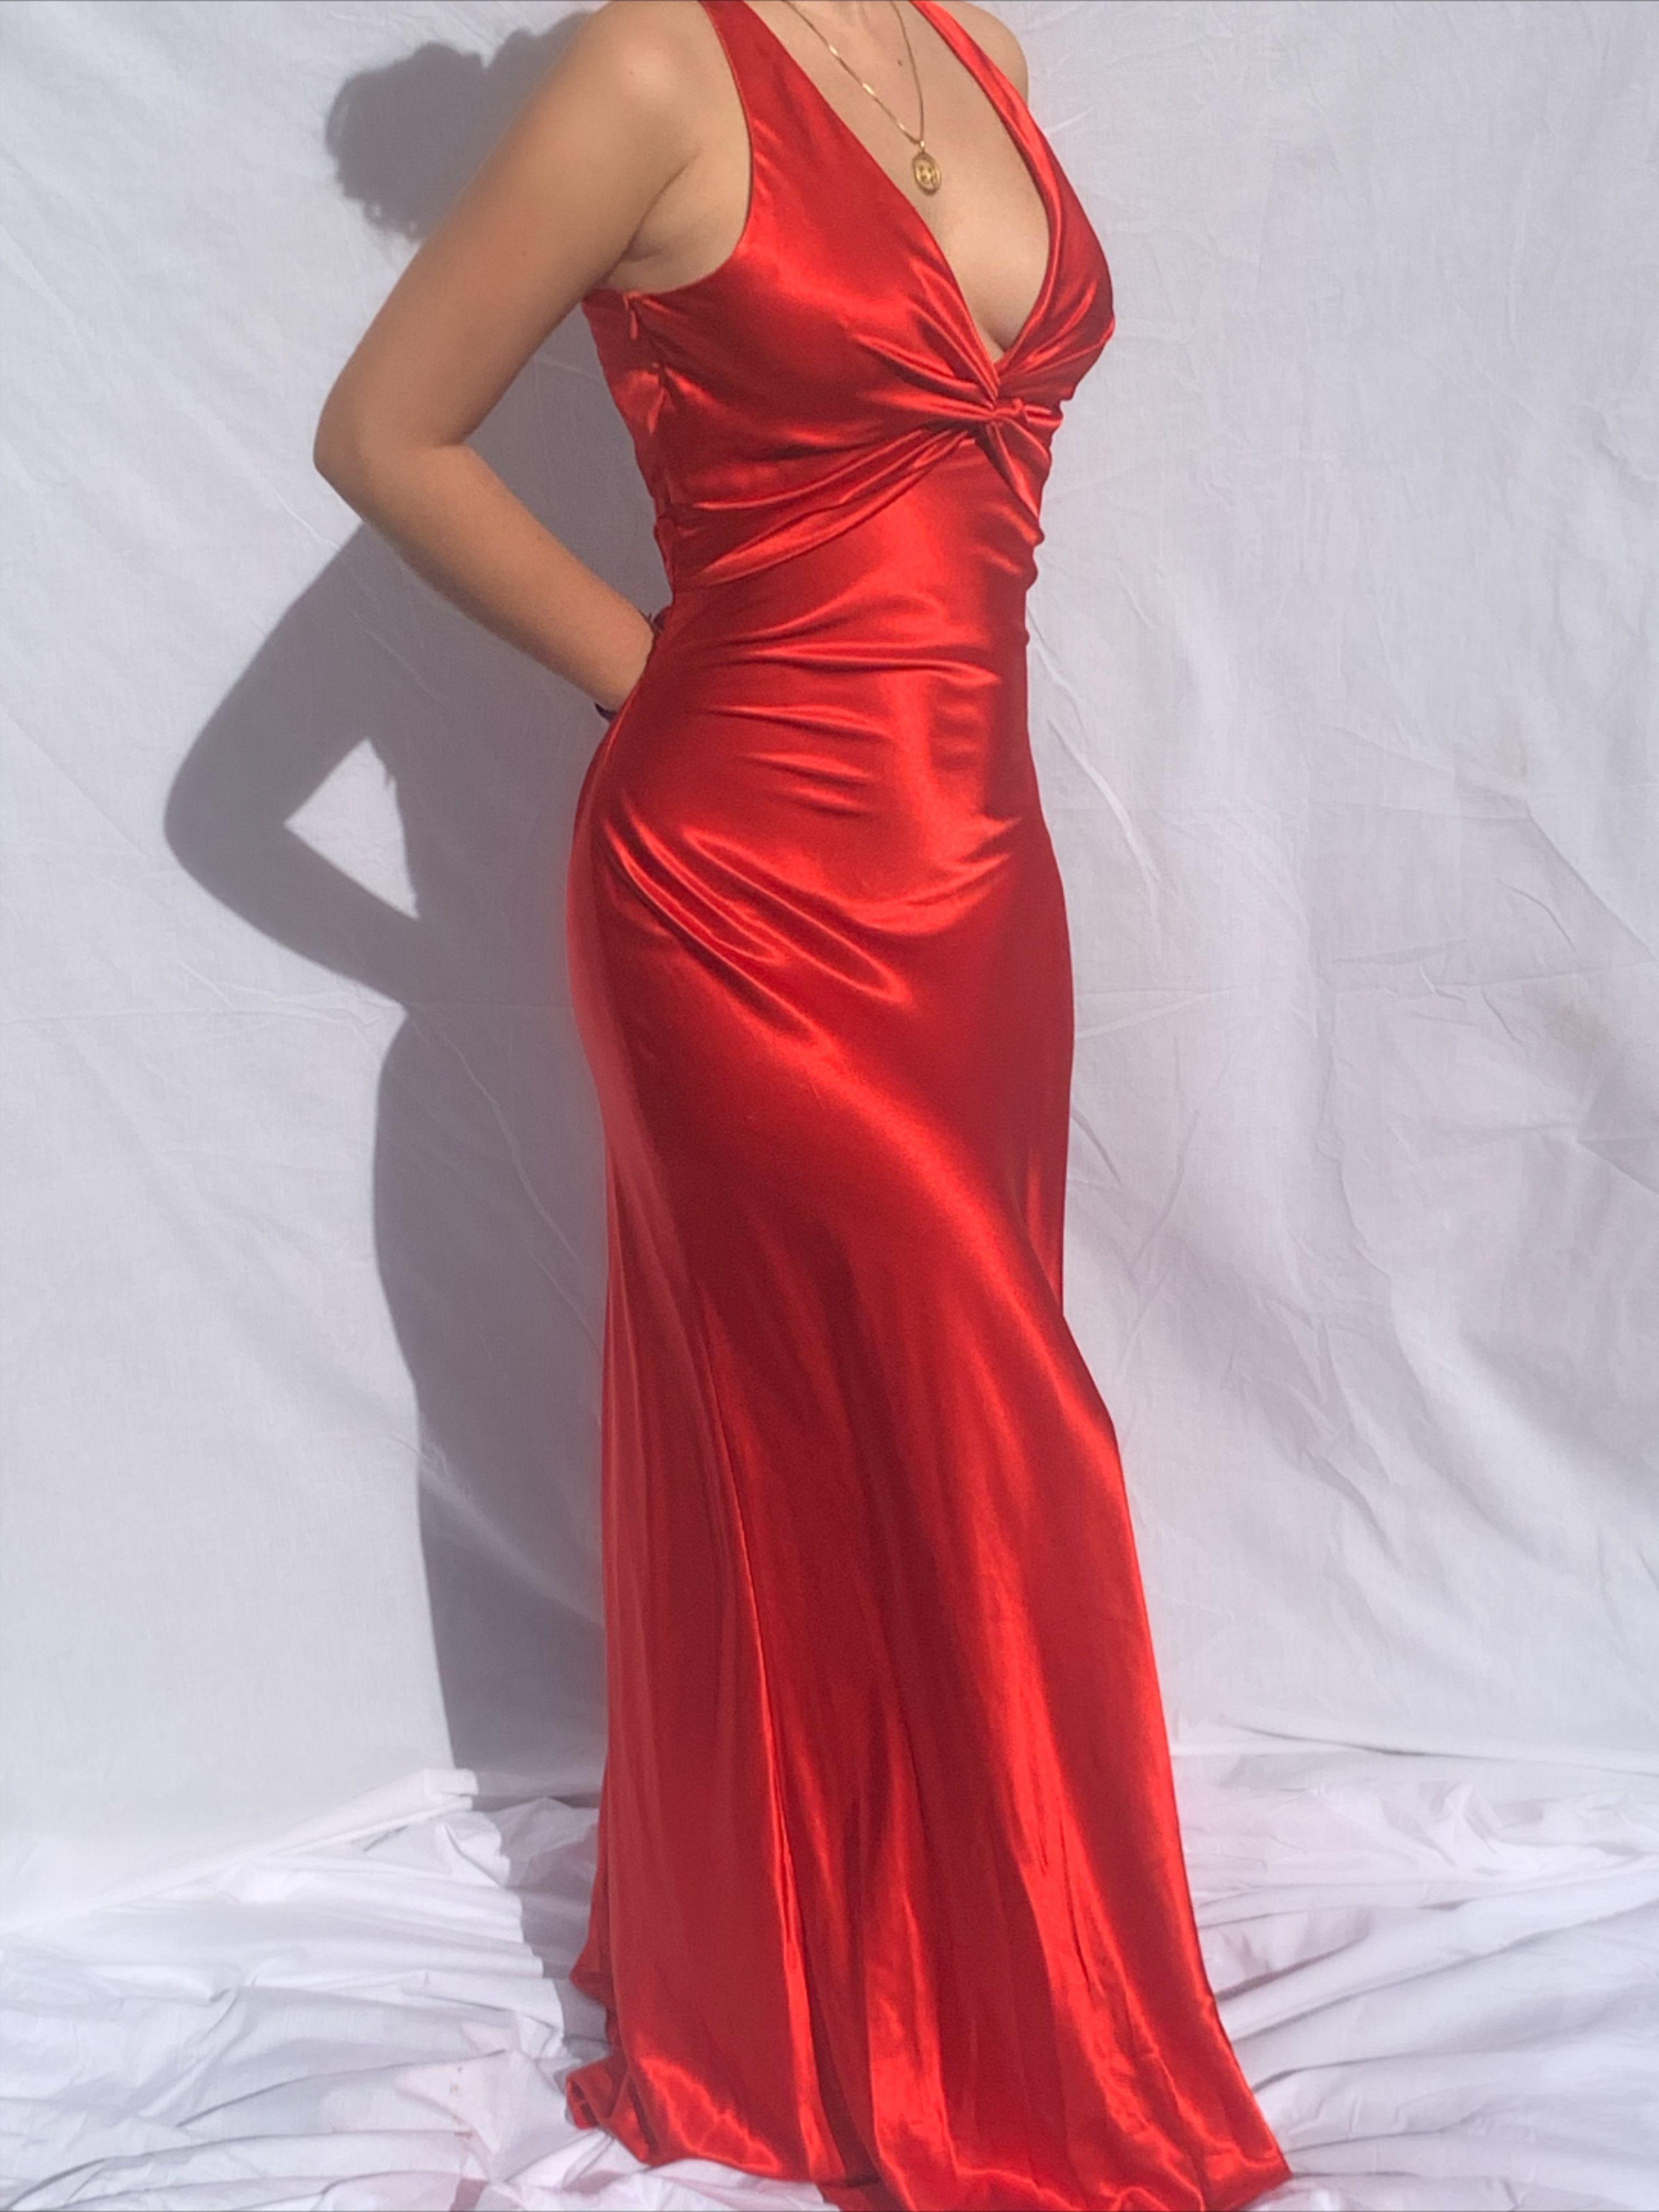 Buffy Vintage 90s Prom Dresses Pretty Red Prom Dresses Red Silk Prom Dress [ 4032 x 3024 Pixel ]